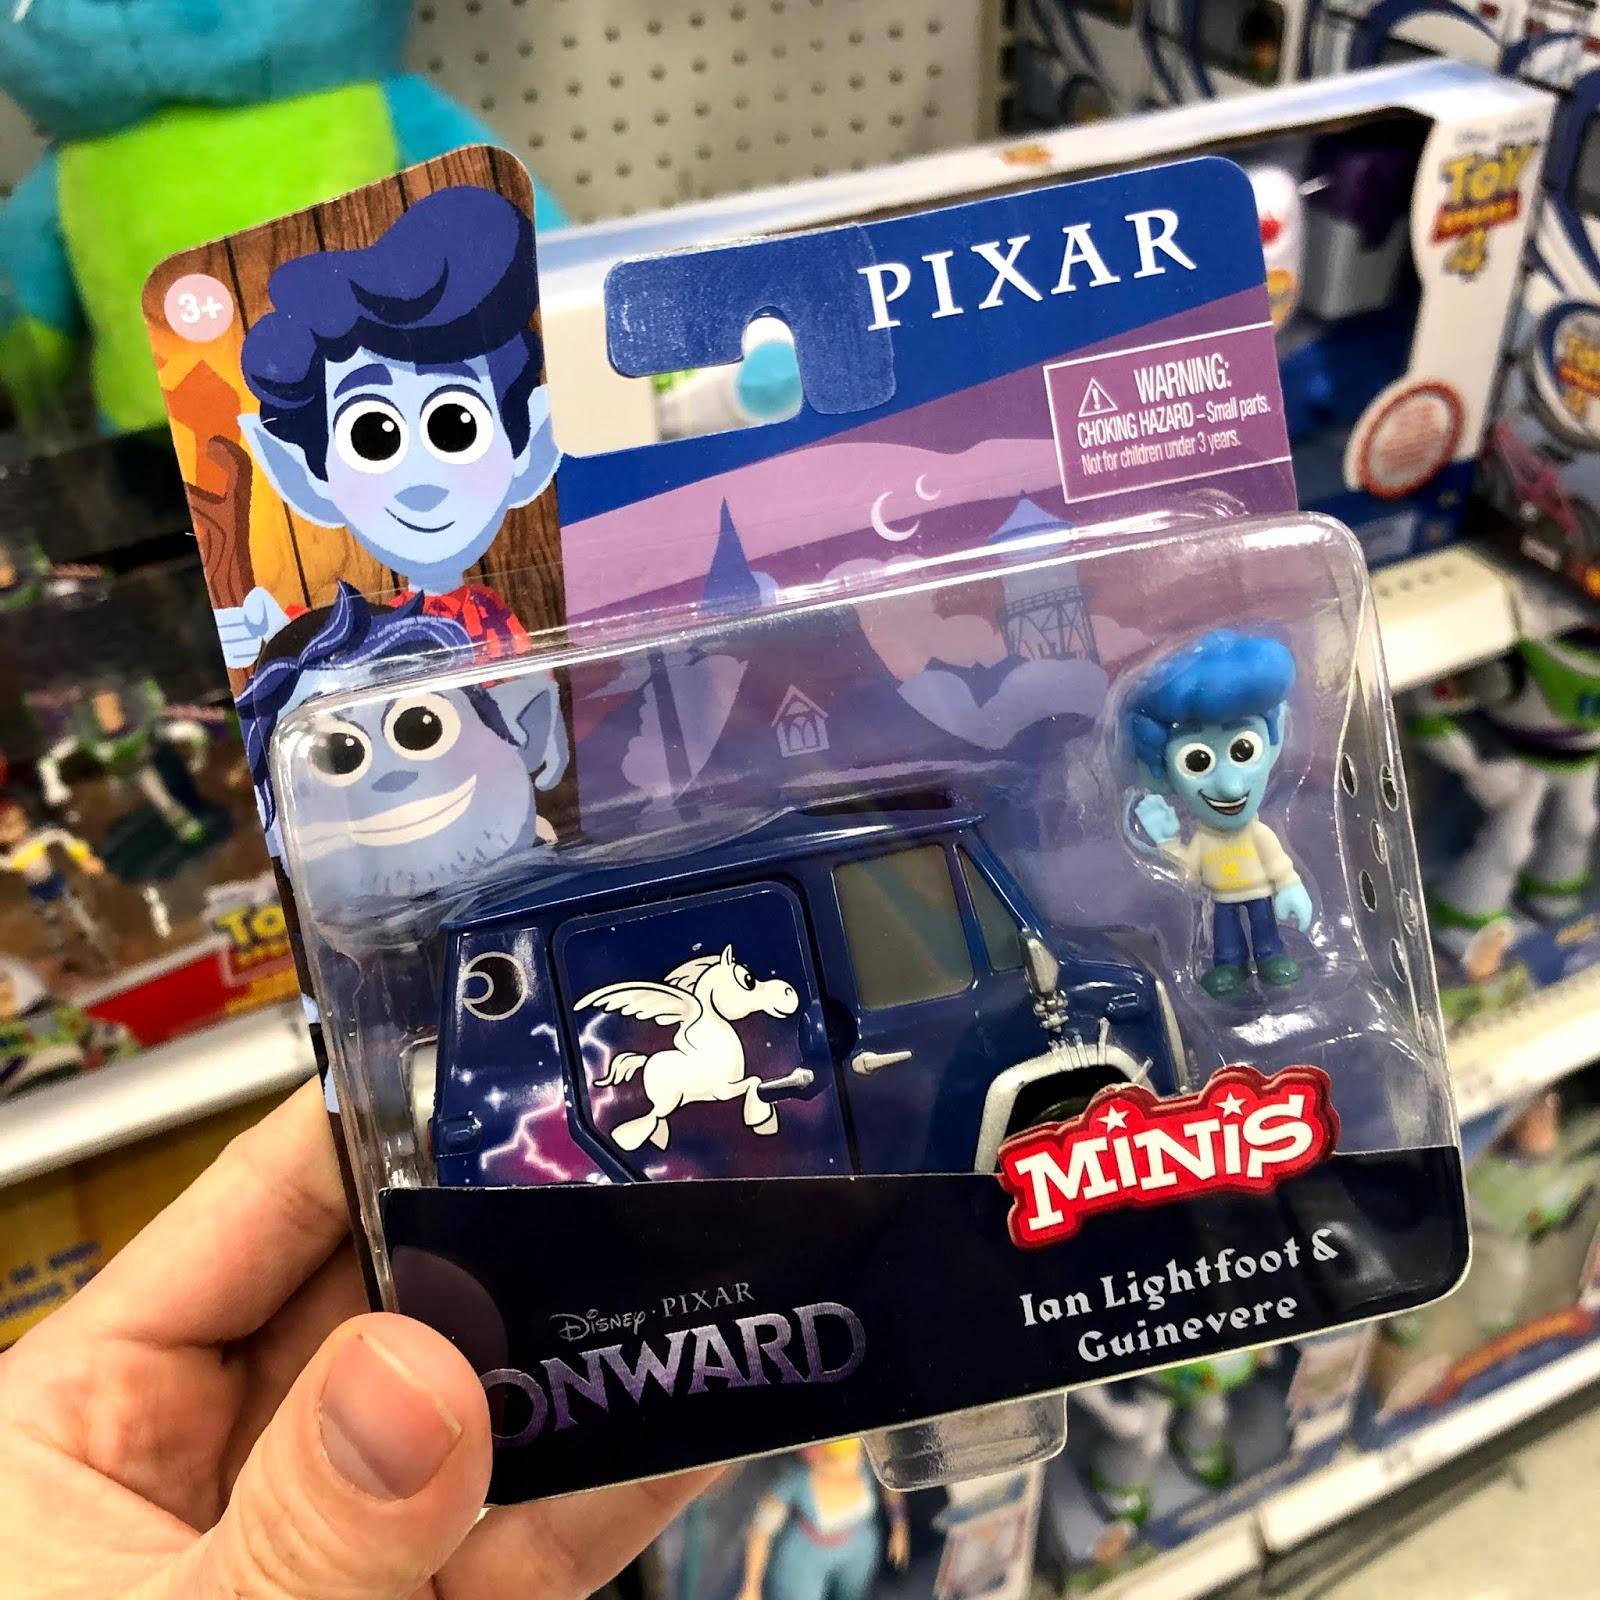 pixar onward toys minis guinevere